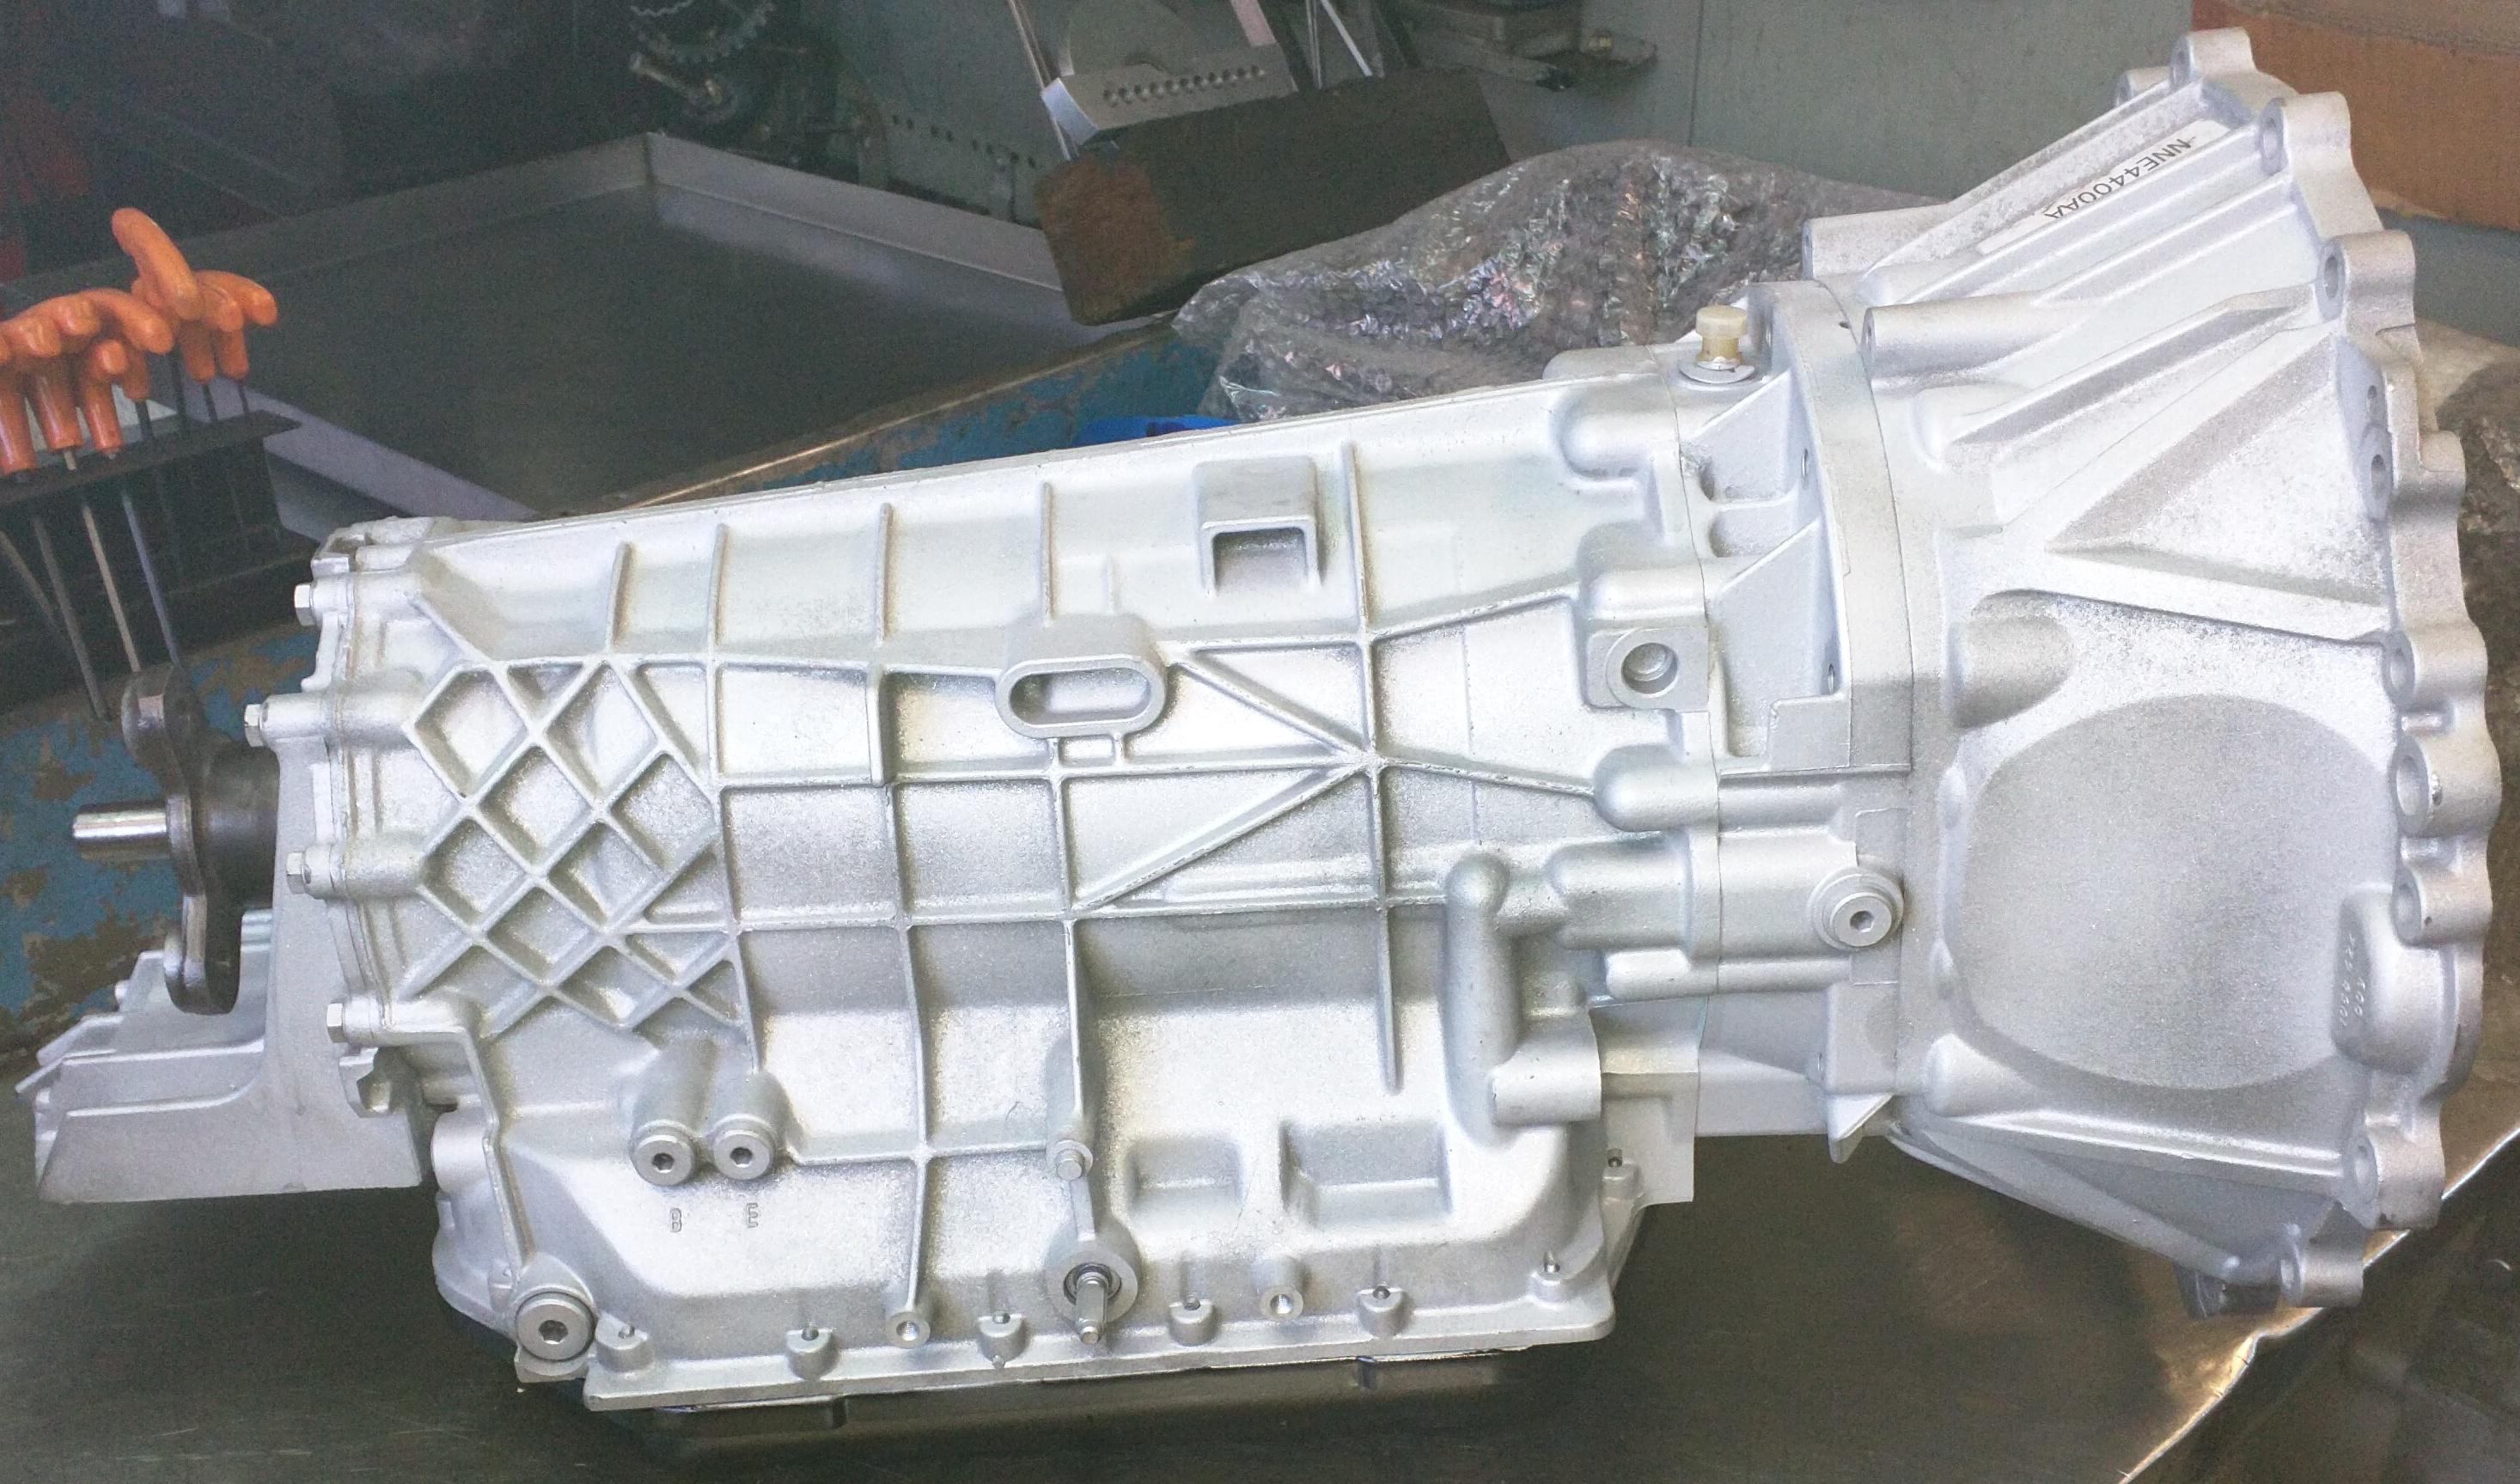 xjr type jaguar transmission xkr oil watch youtube fluid supercharged power vaden plas steering